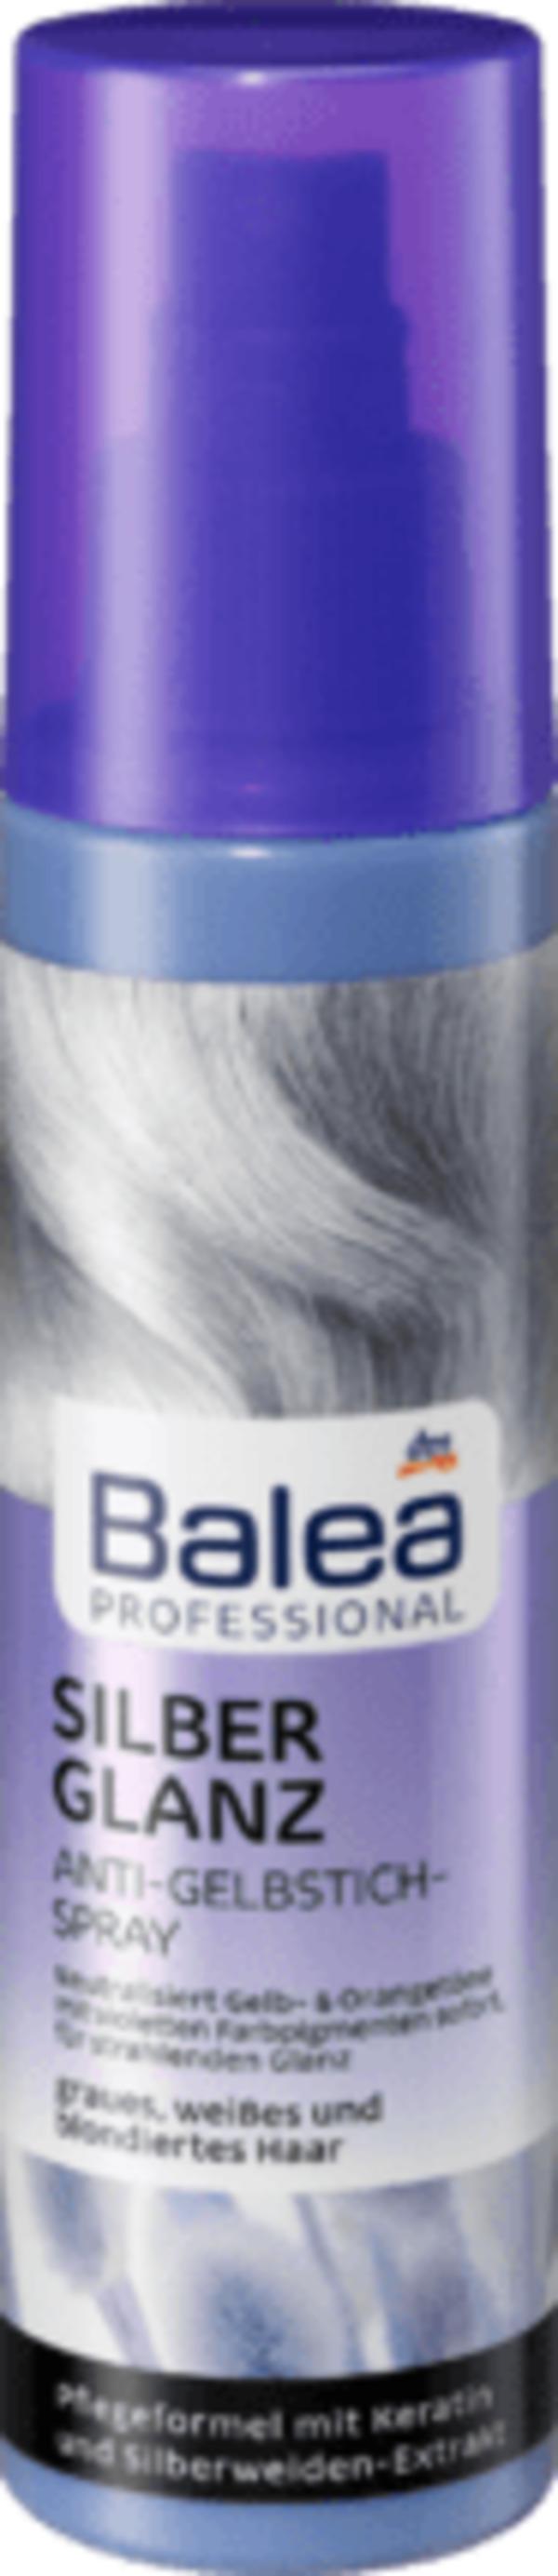 Balea Professional Anti-Gelbstich Spray Silberglanz